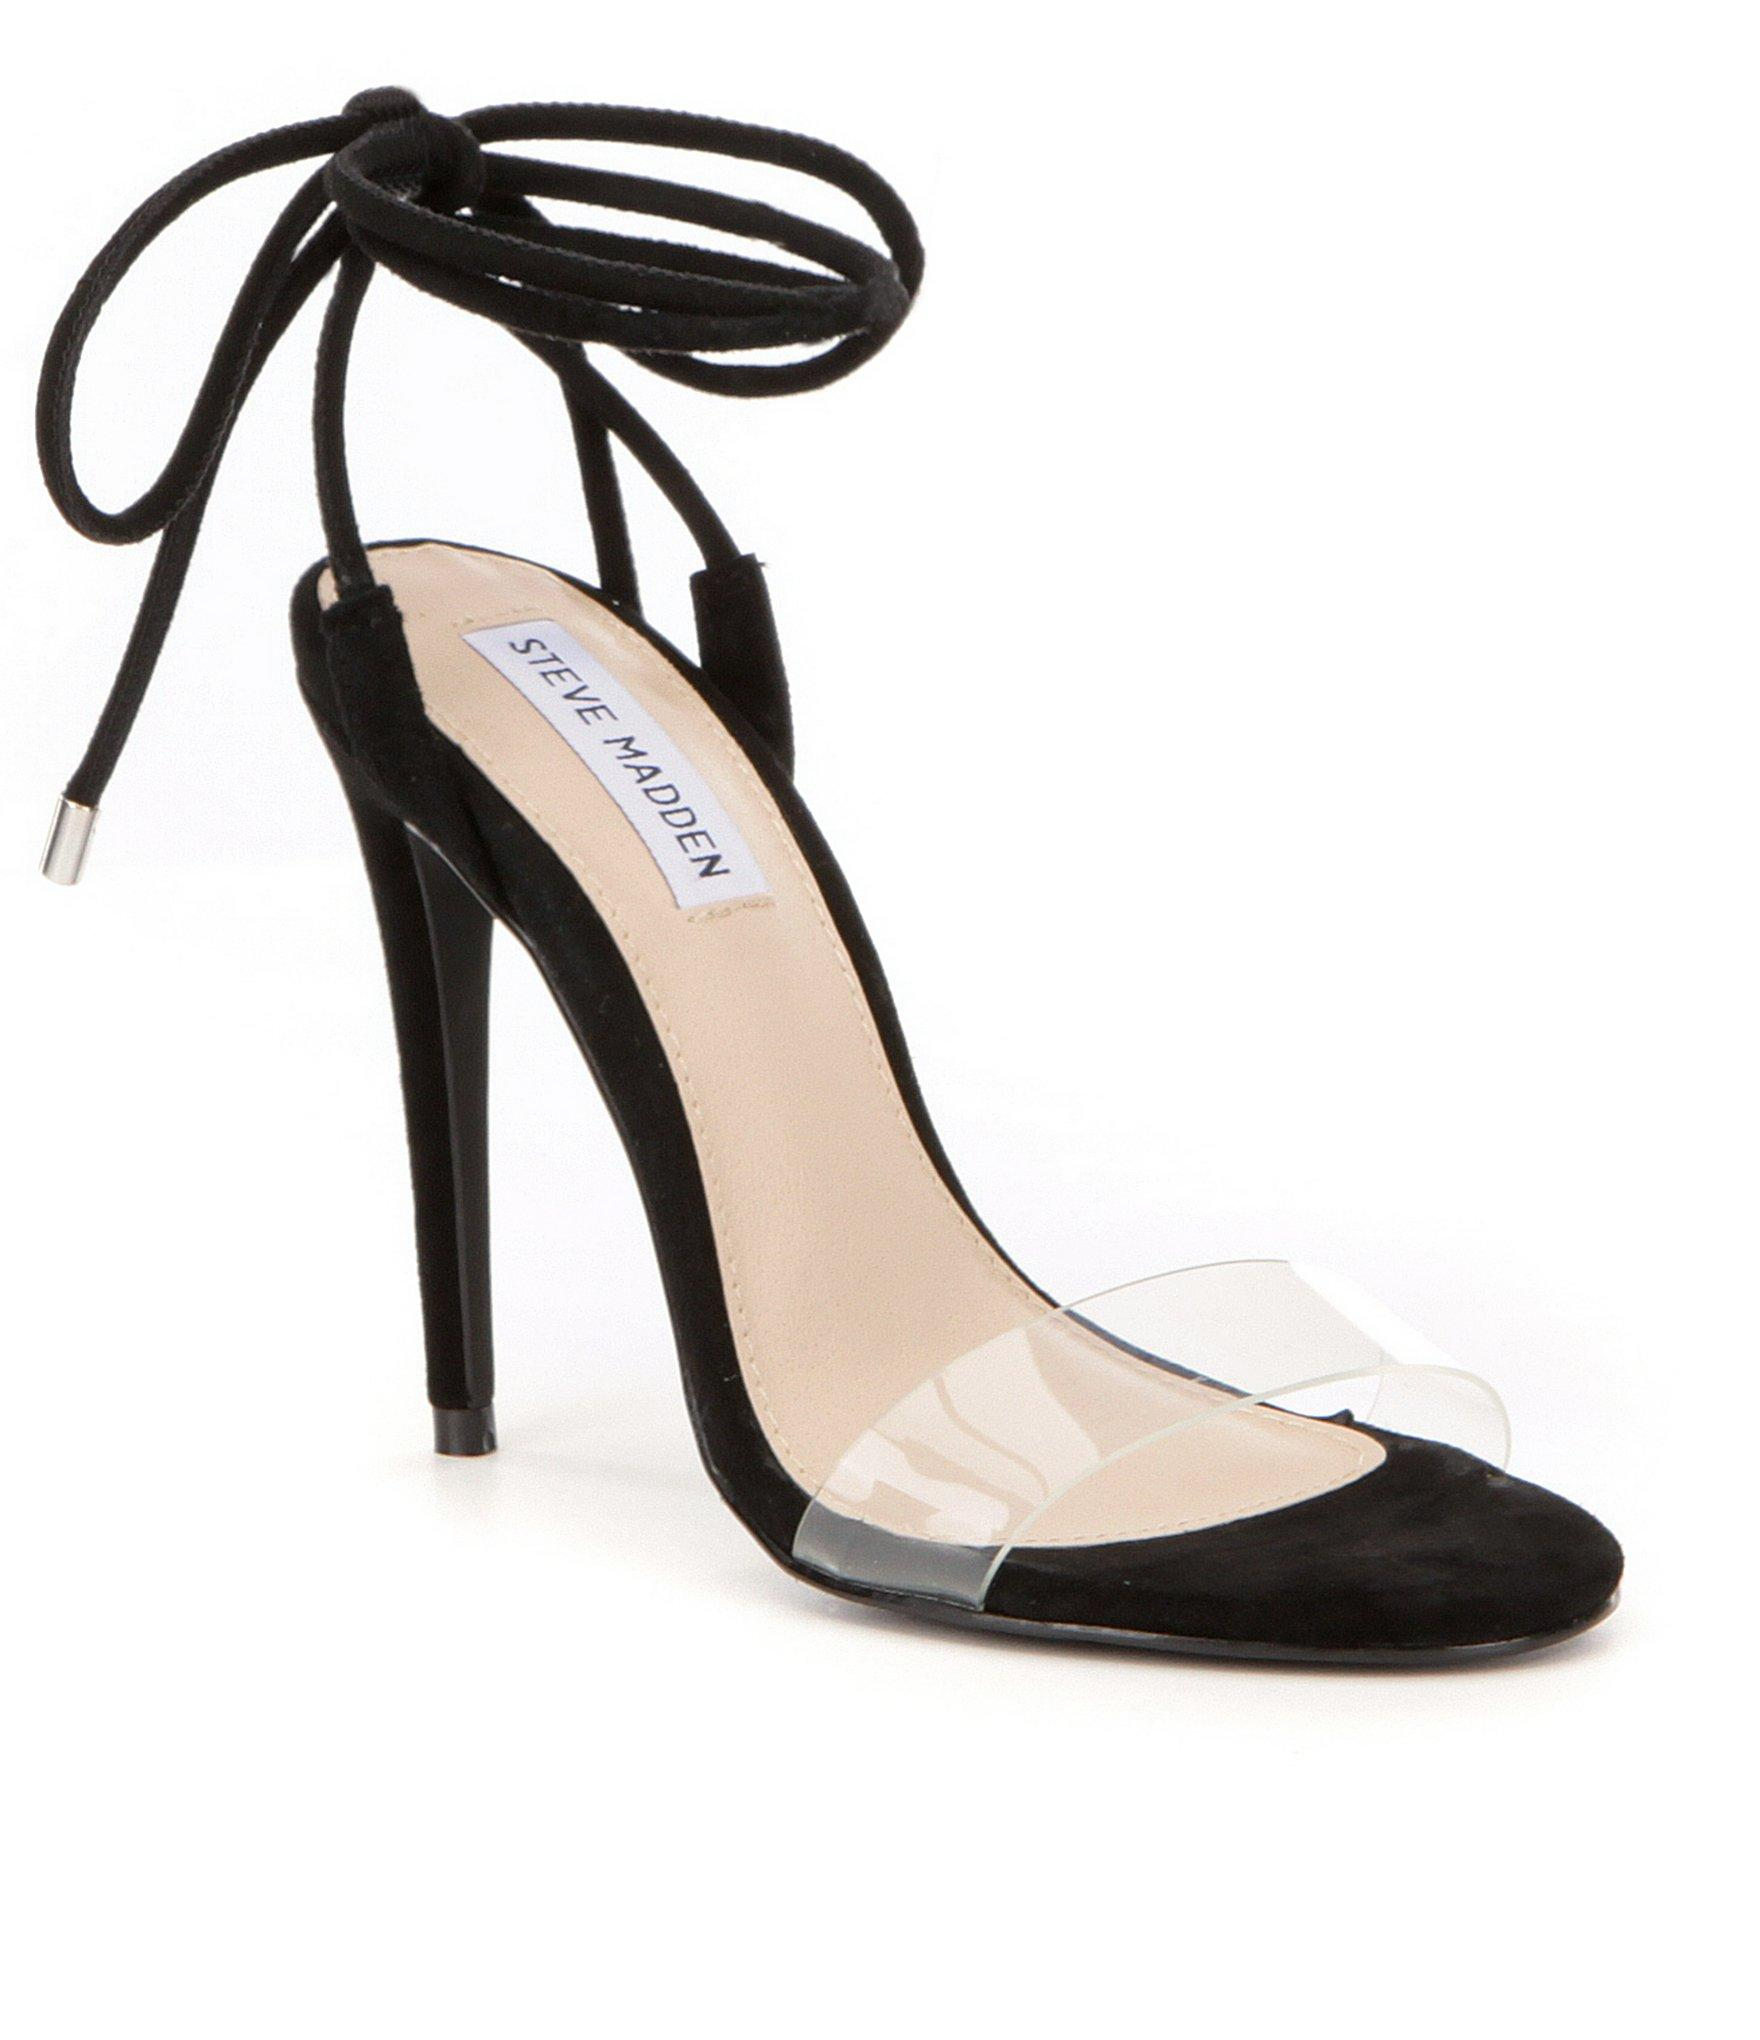 a4efceeebcb Steve Madden Black Lyla Ankle Tie Dress Sandals